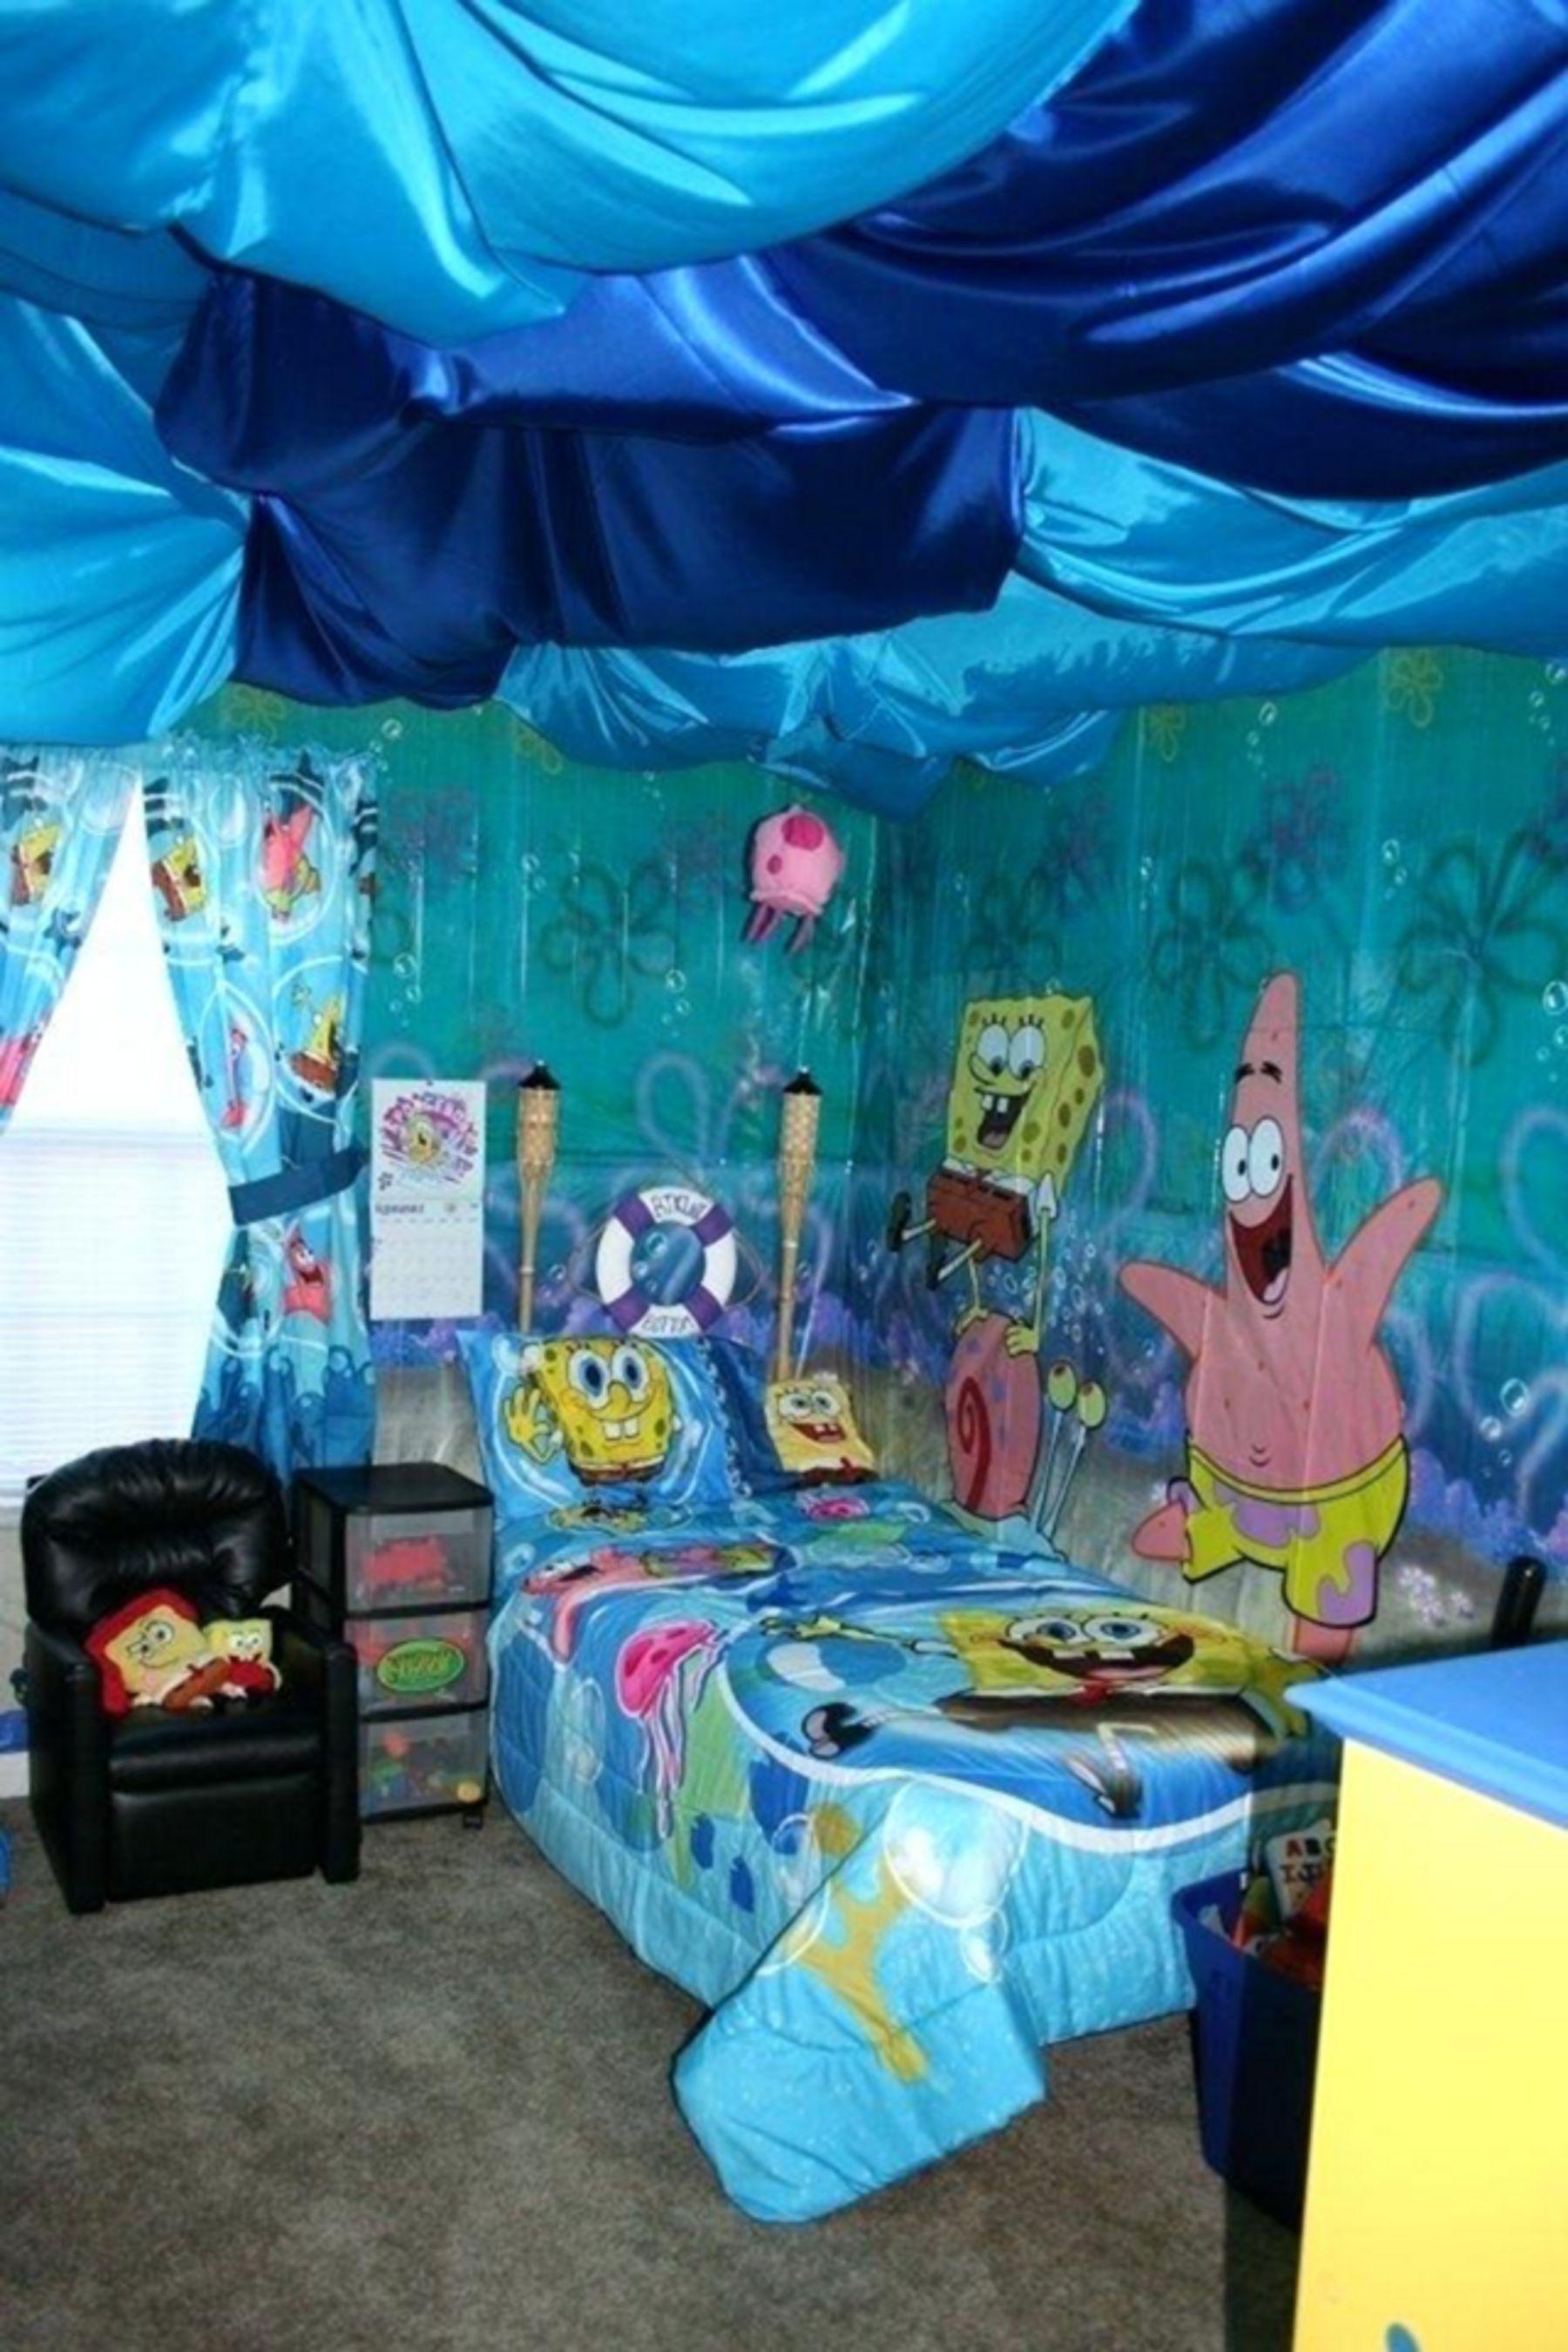 Adorable 25 Cute Kids Bedroom Decorating Ideas For Your Kids Bedroom Https Bosidolot Com 2018 11 16 25 Cute Kids Kids Bedroom Decor Kid Room Decor Kids Room Spongebob bedroom set images